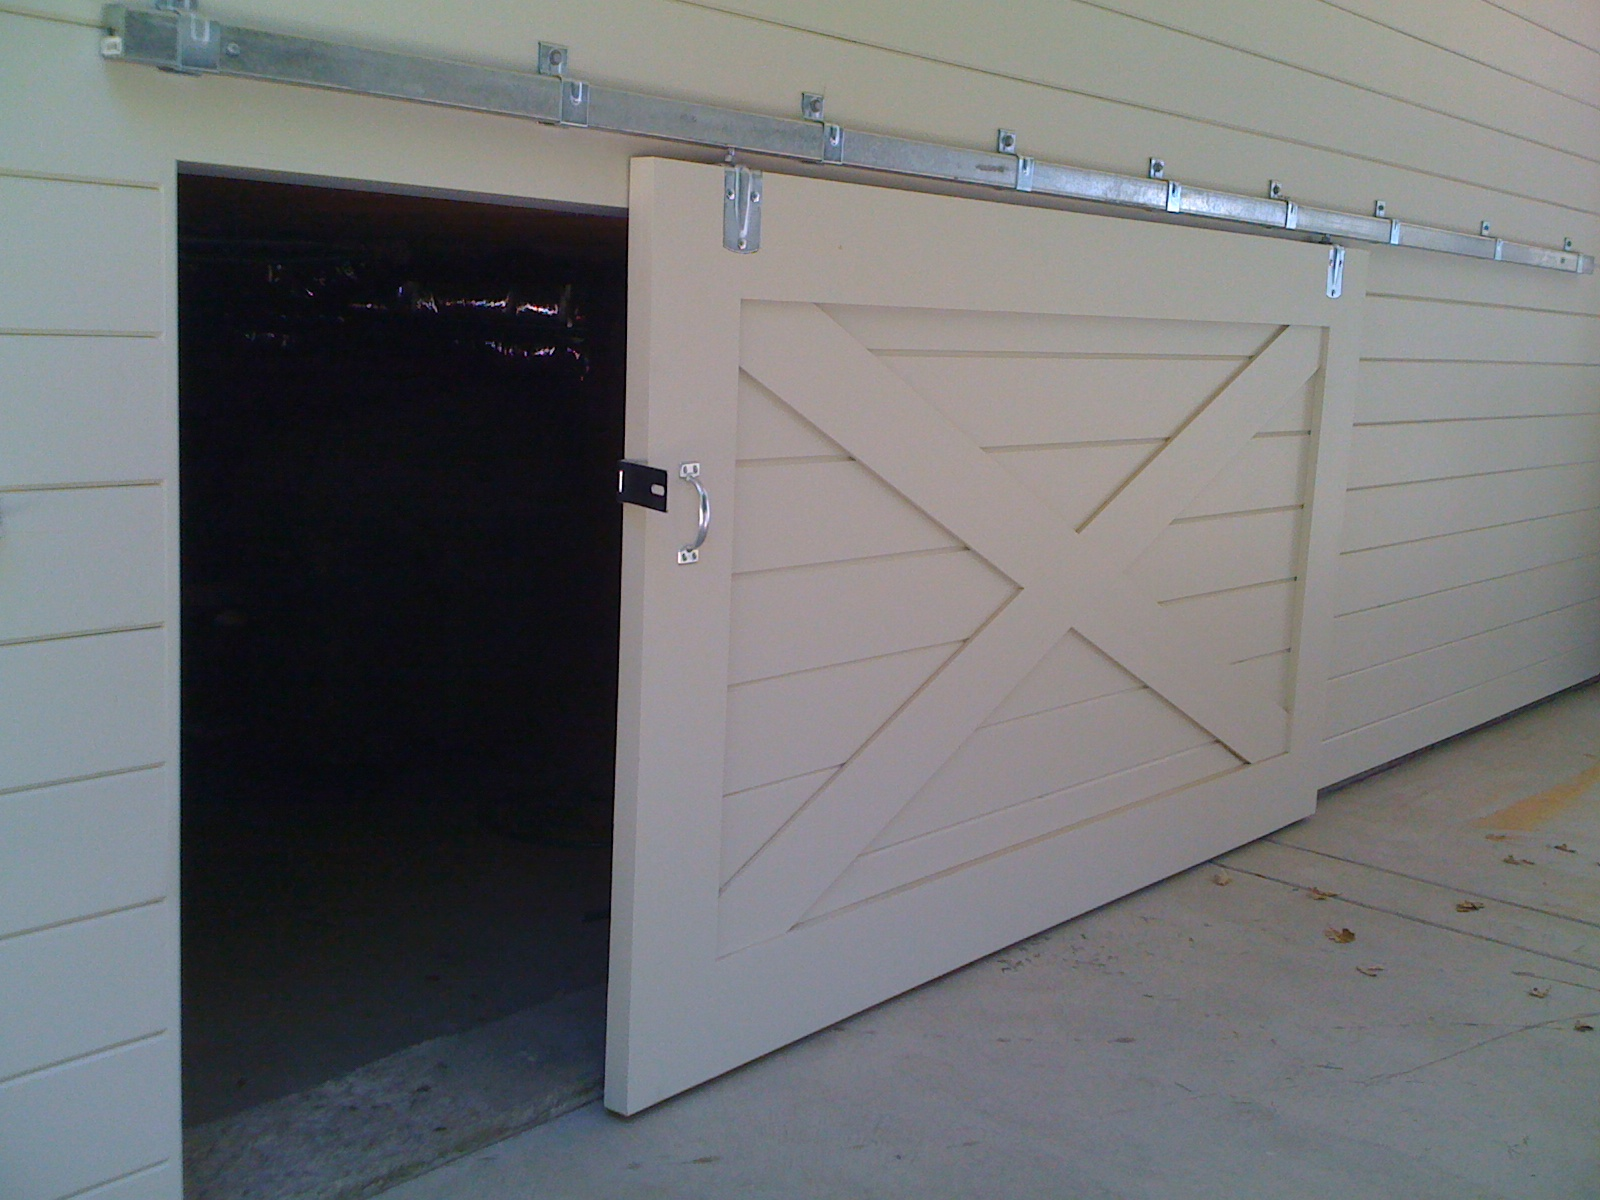 construct barn doors for track lightsRoselawnlutheran